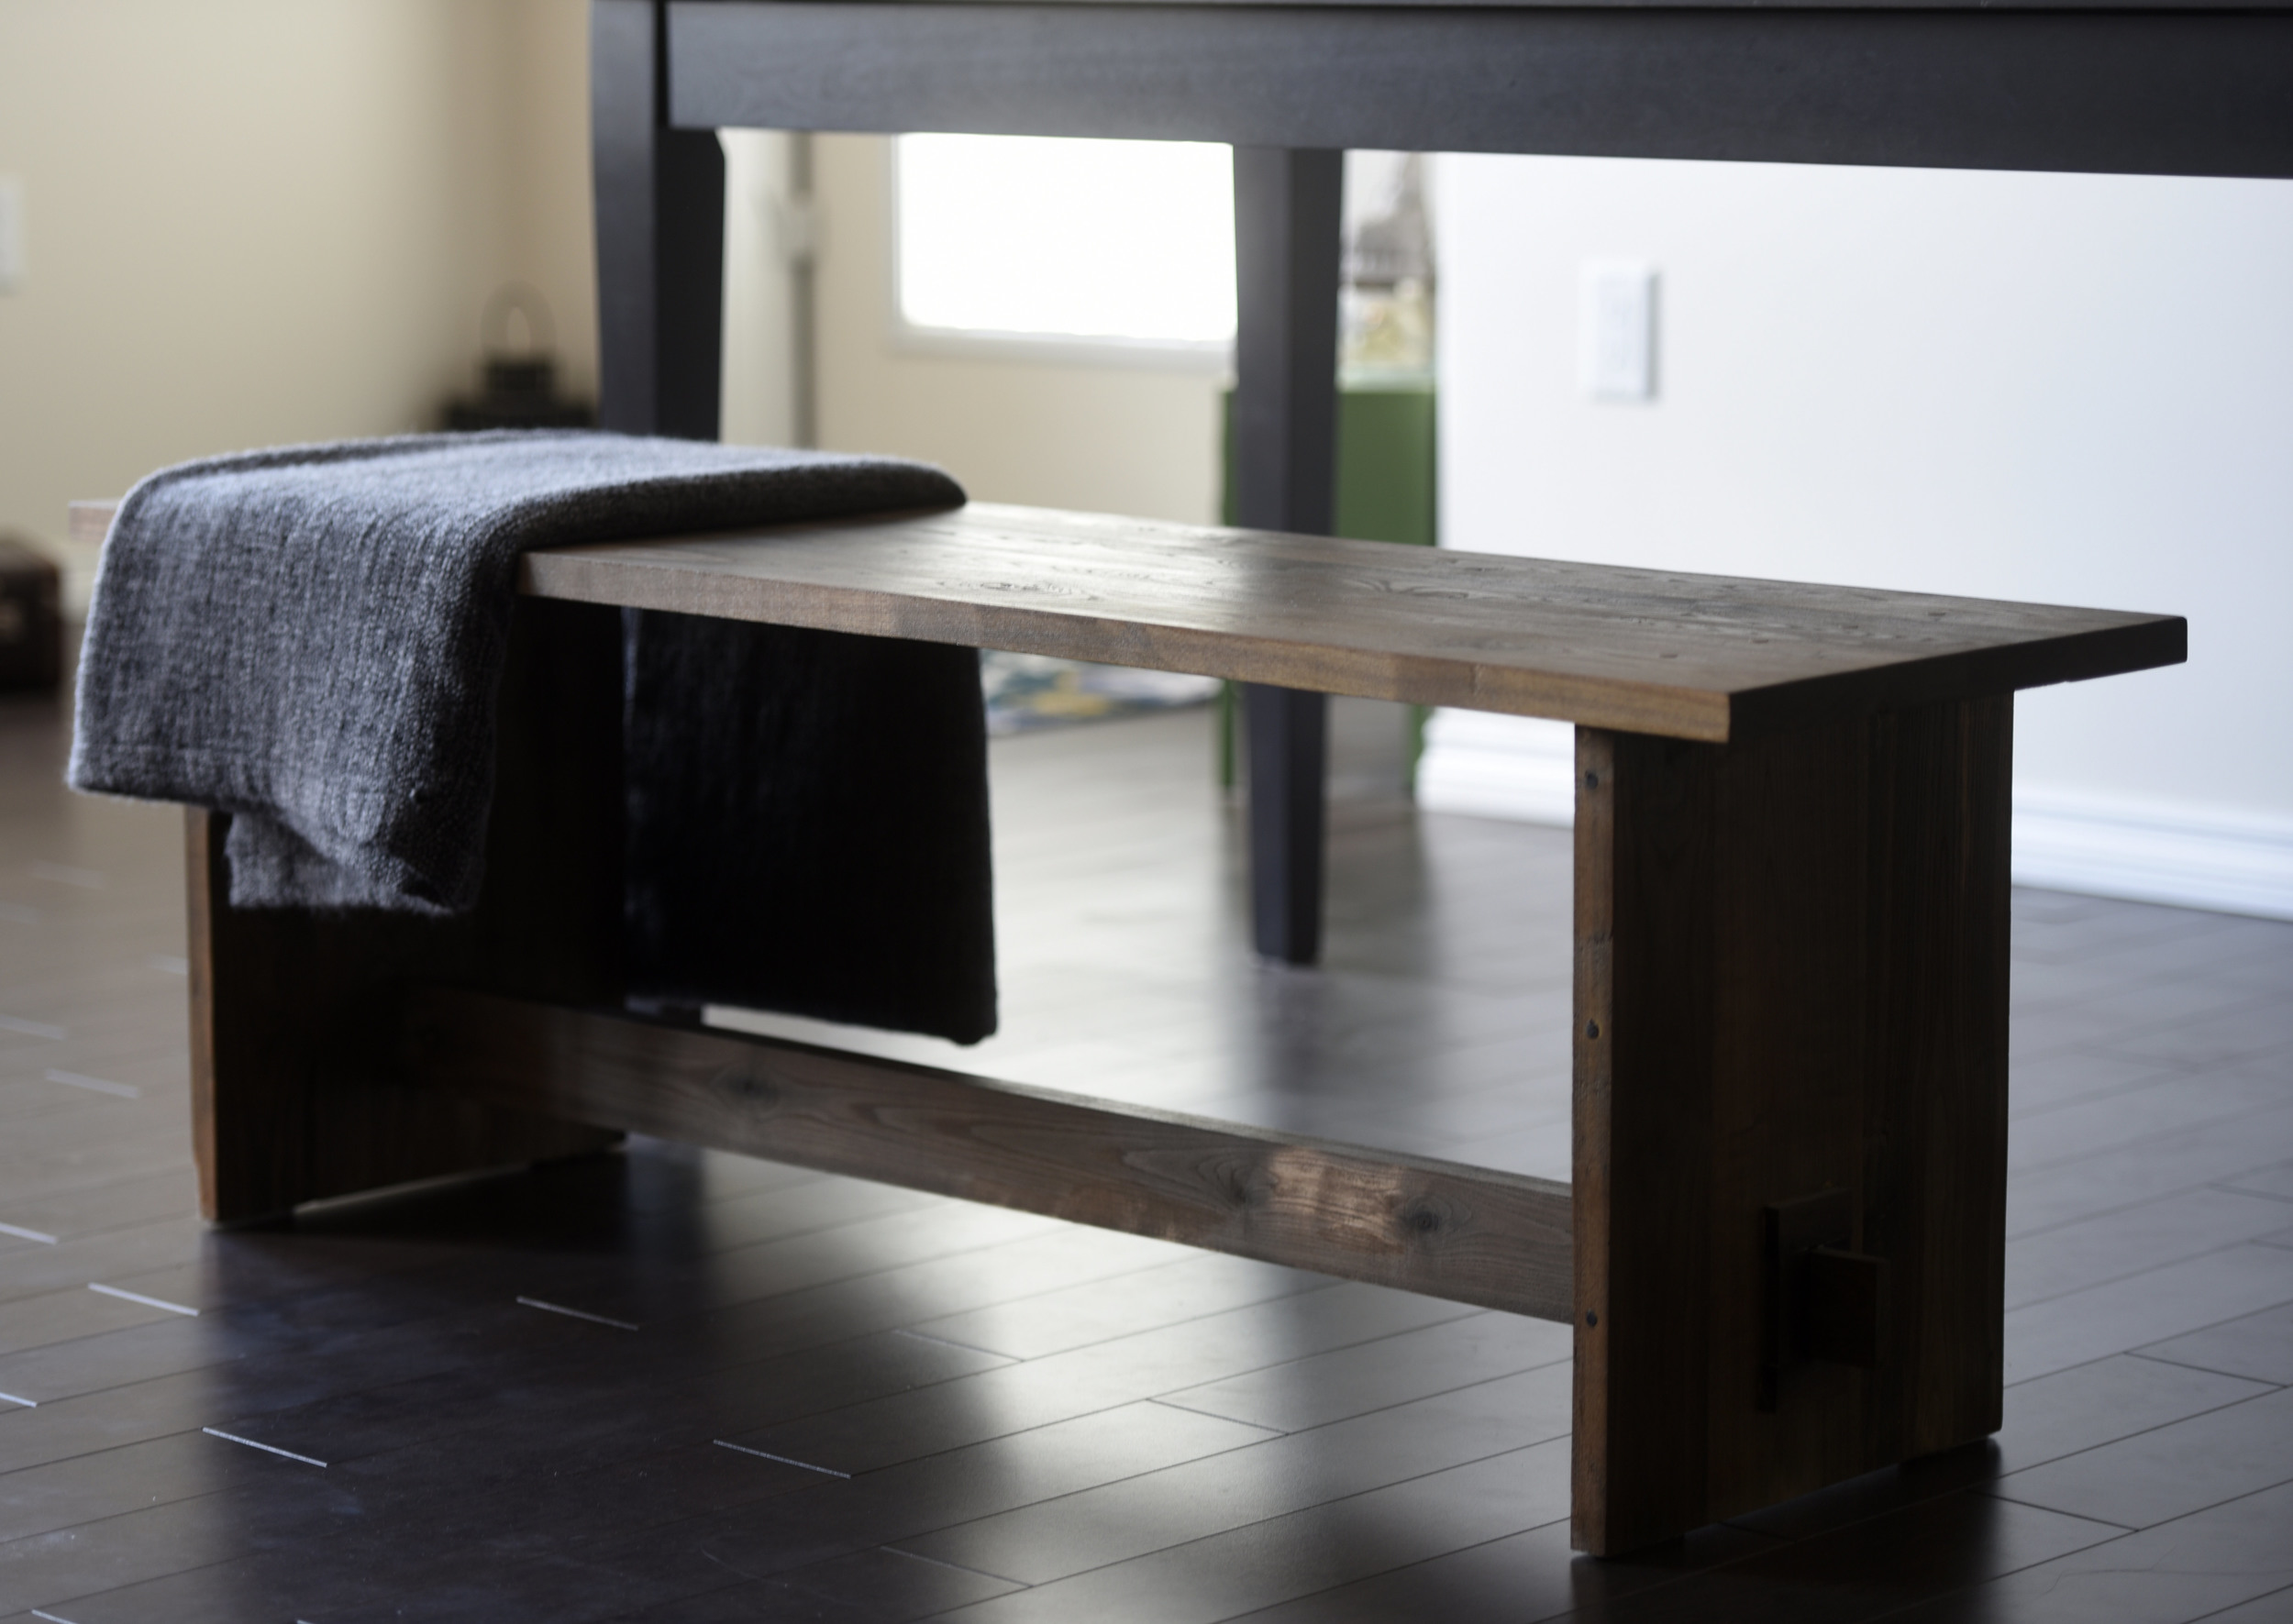 mortise-and-tenon-bench.jpg